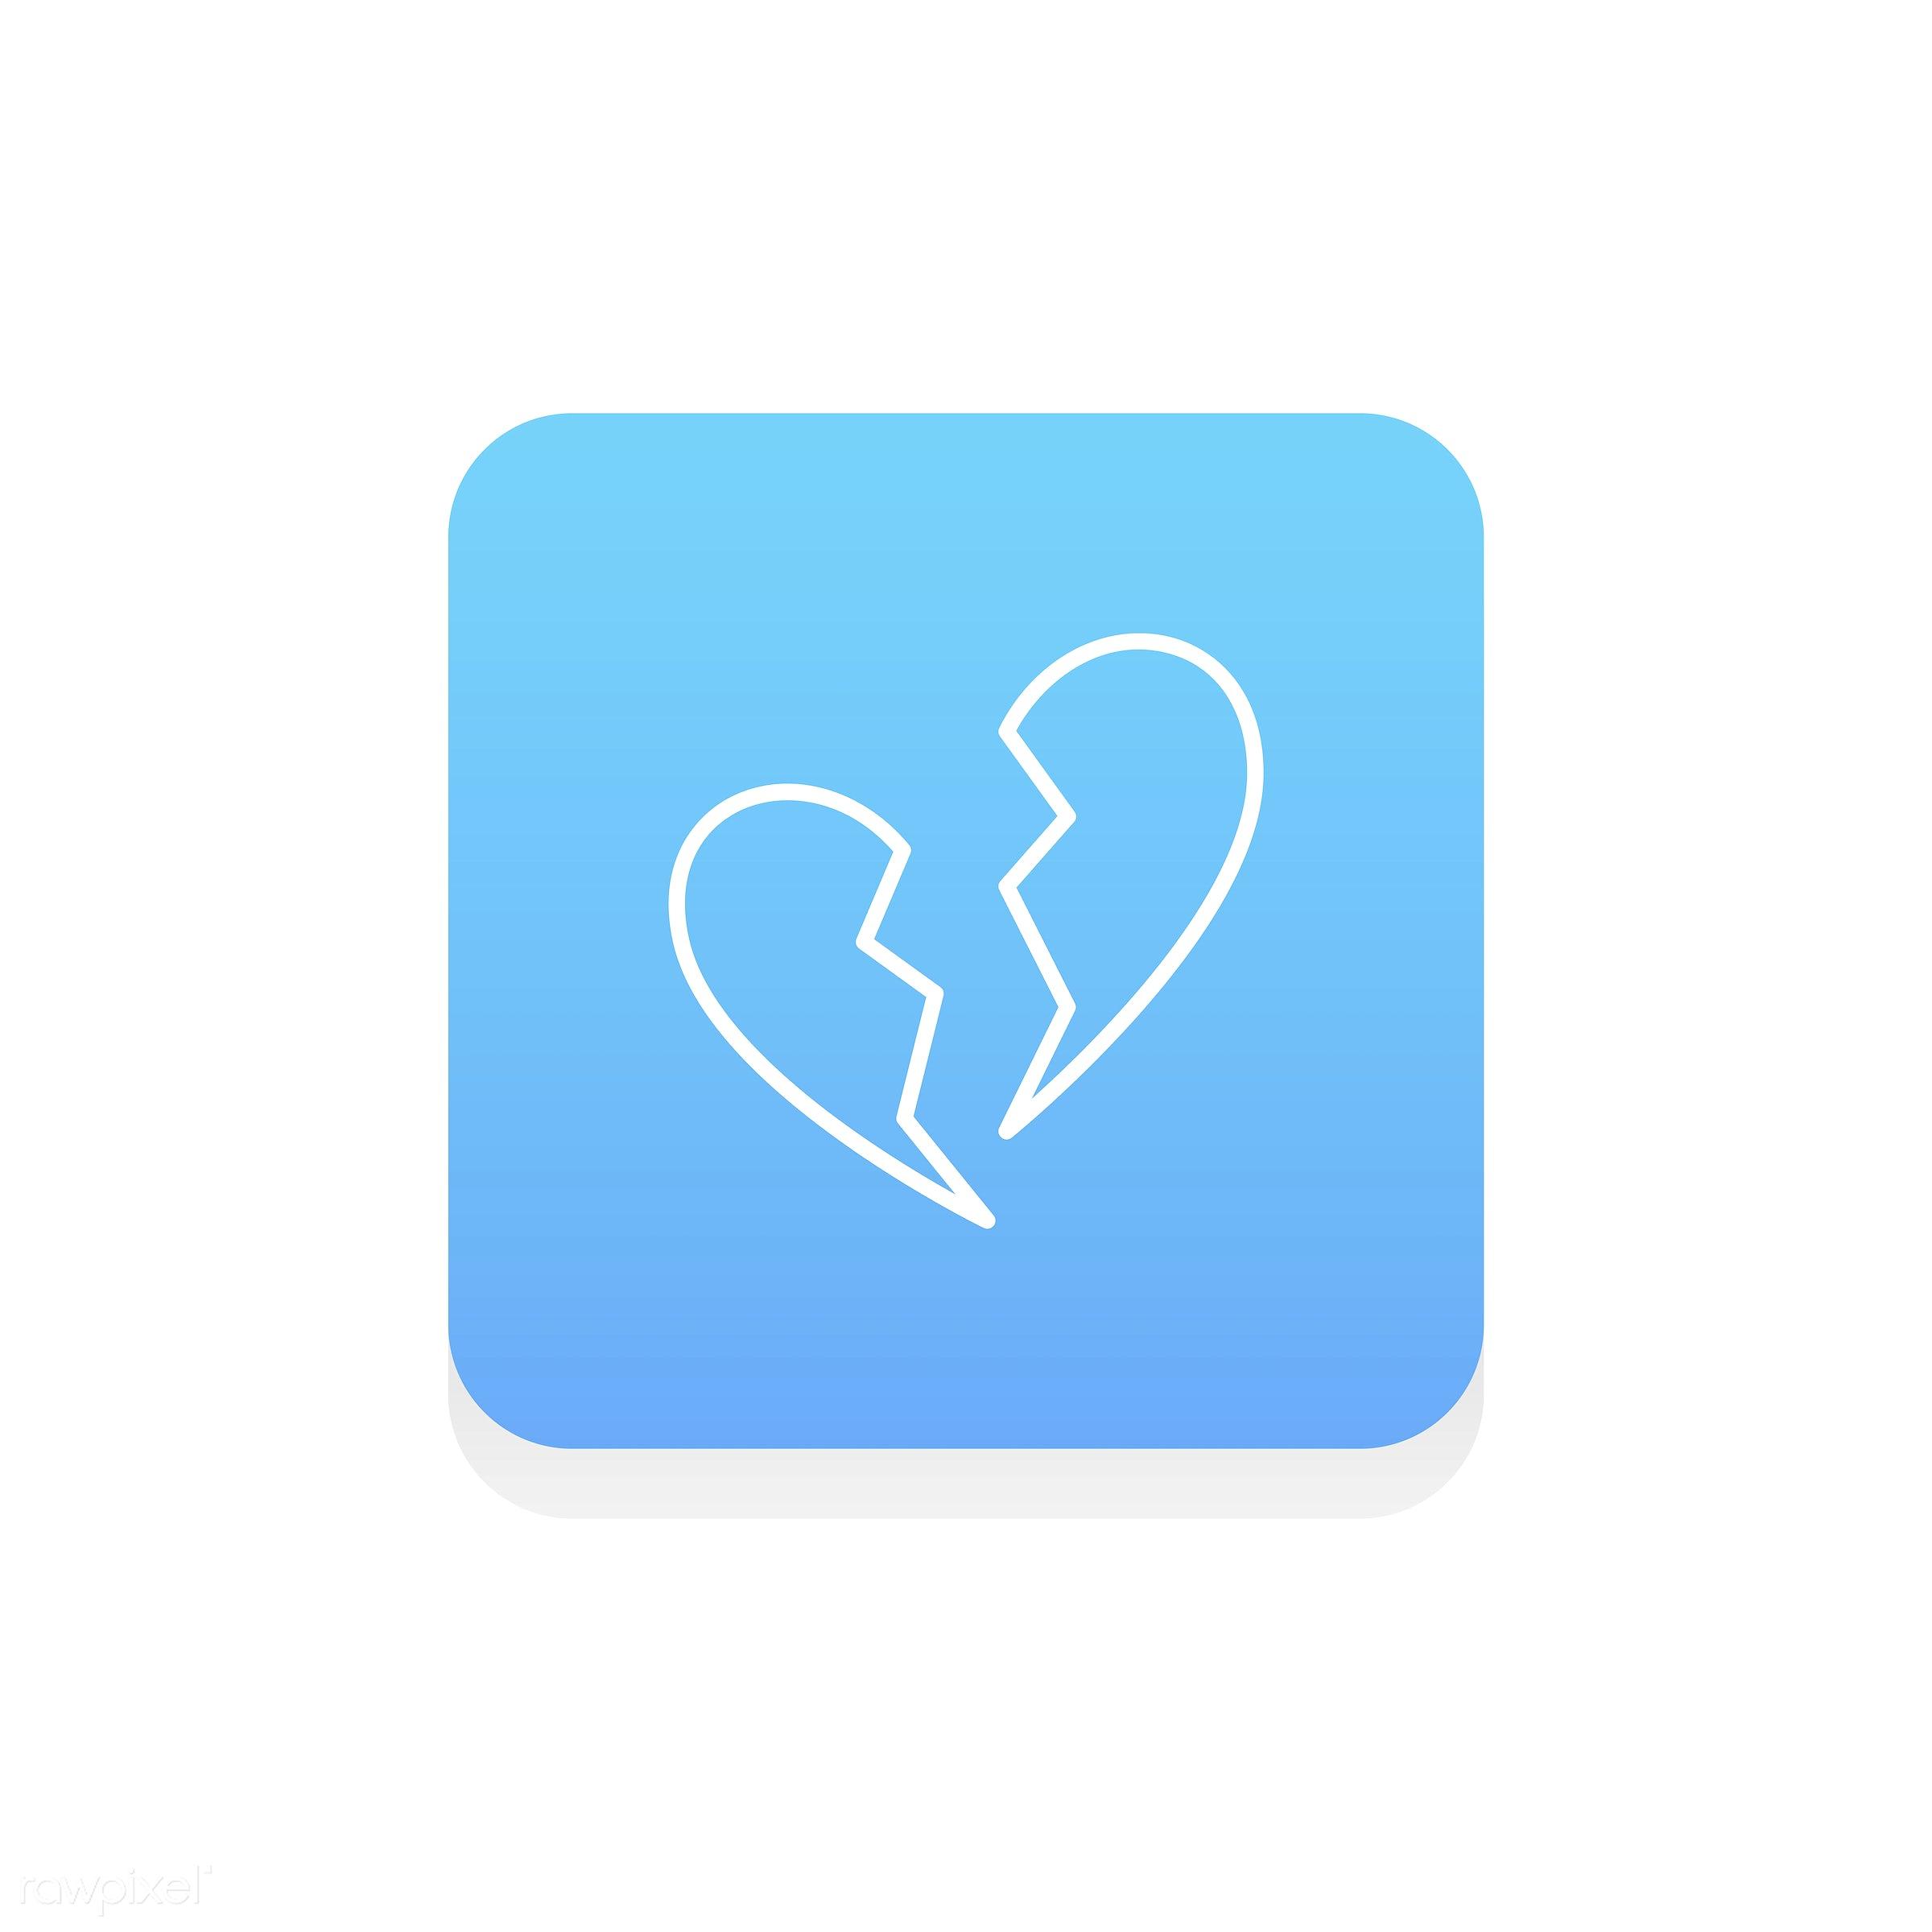 Vector of heart icon - breakup, broke, broken, broken hearted, design, emotion, expression, feeling, flat, graphic, heart,...